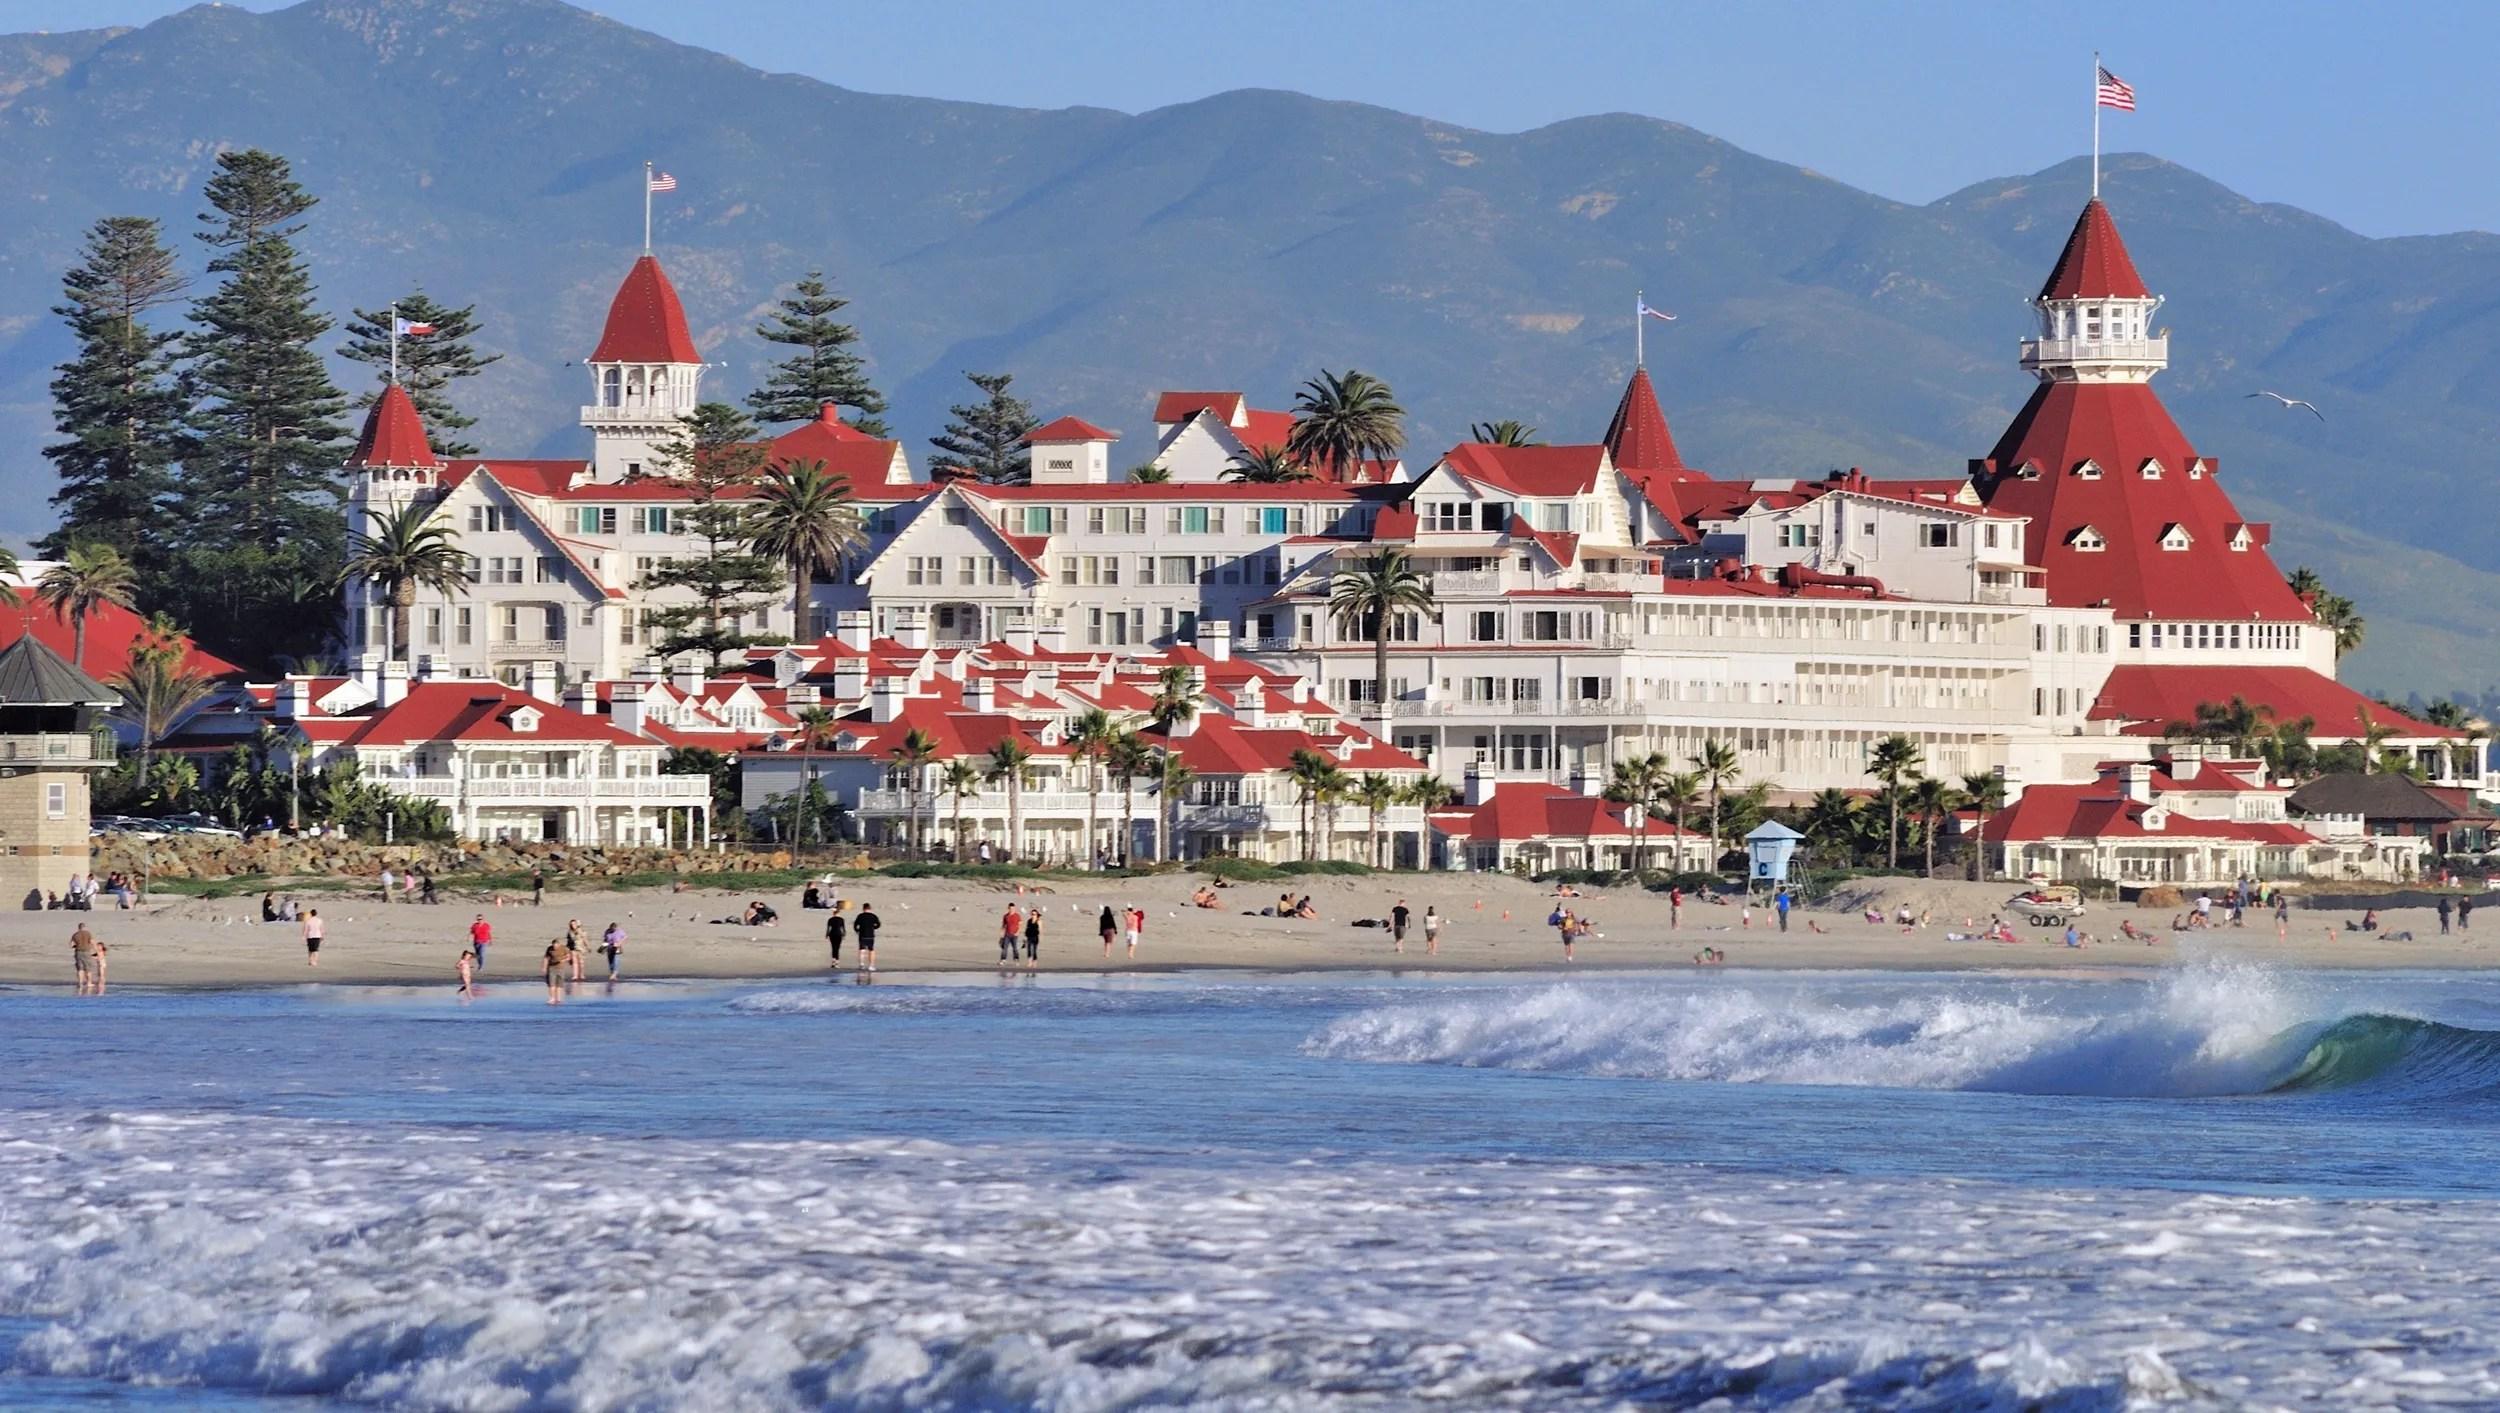 Majestic Hotel Del Coronado San Diego Turns 125